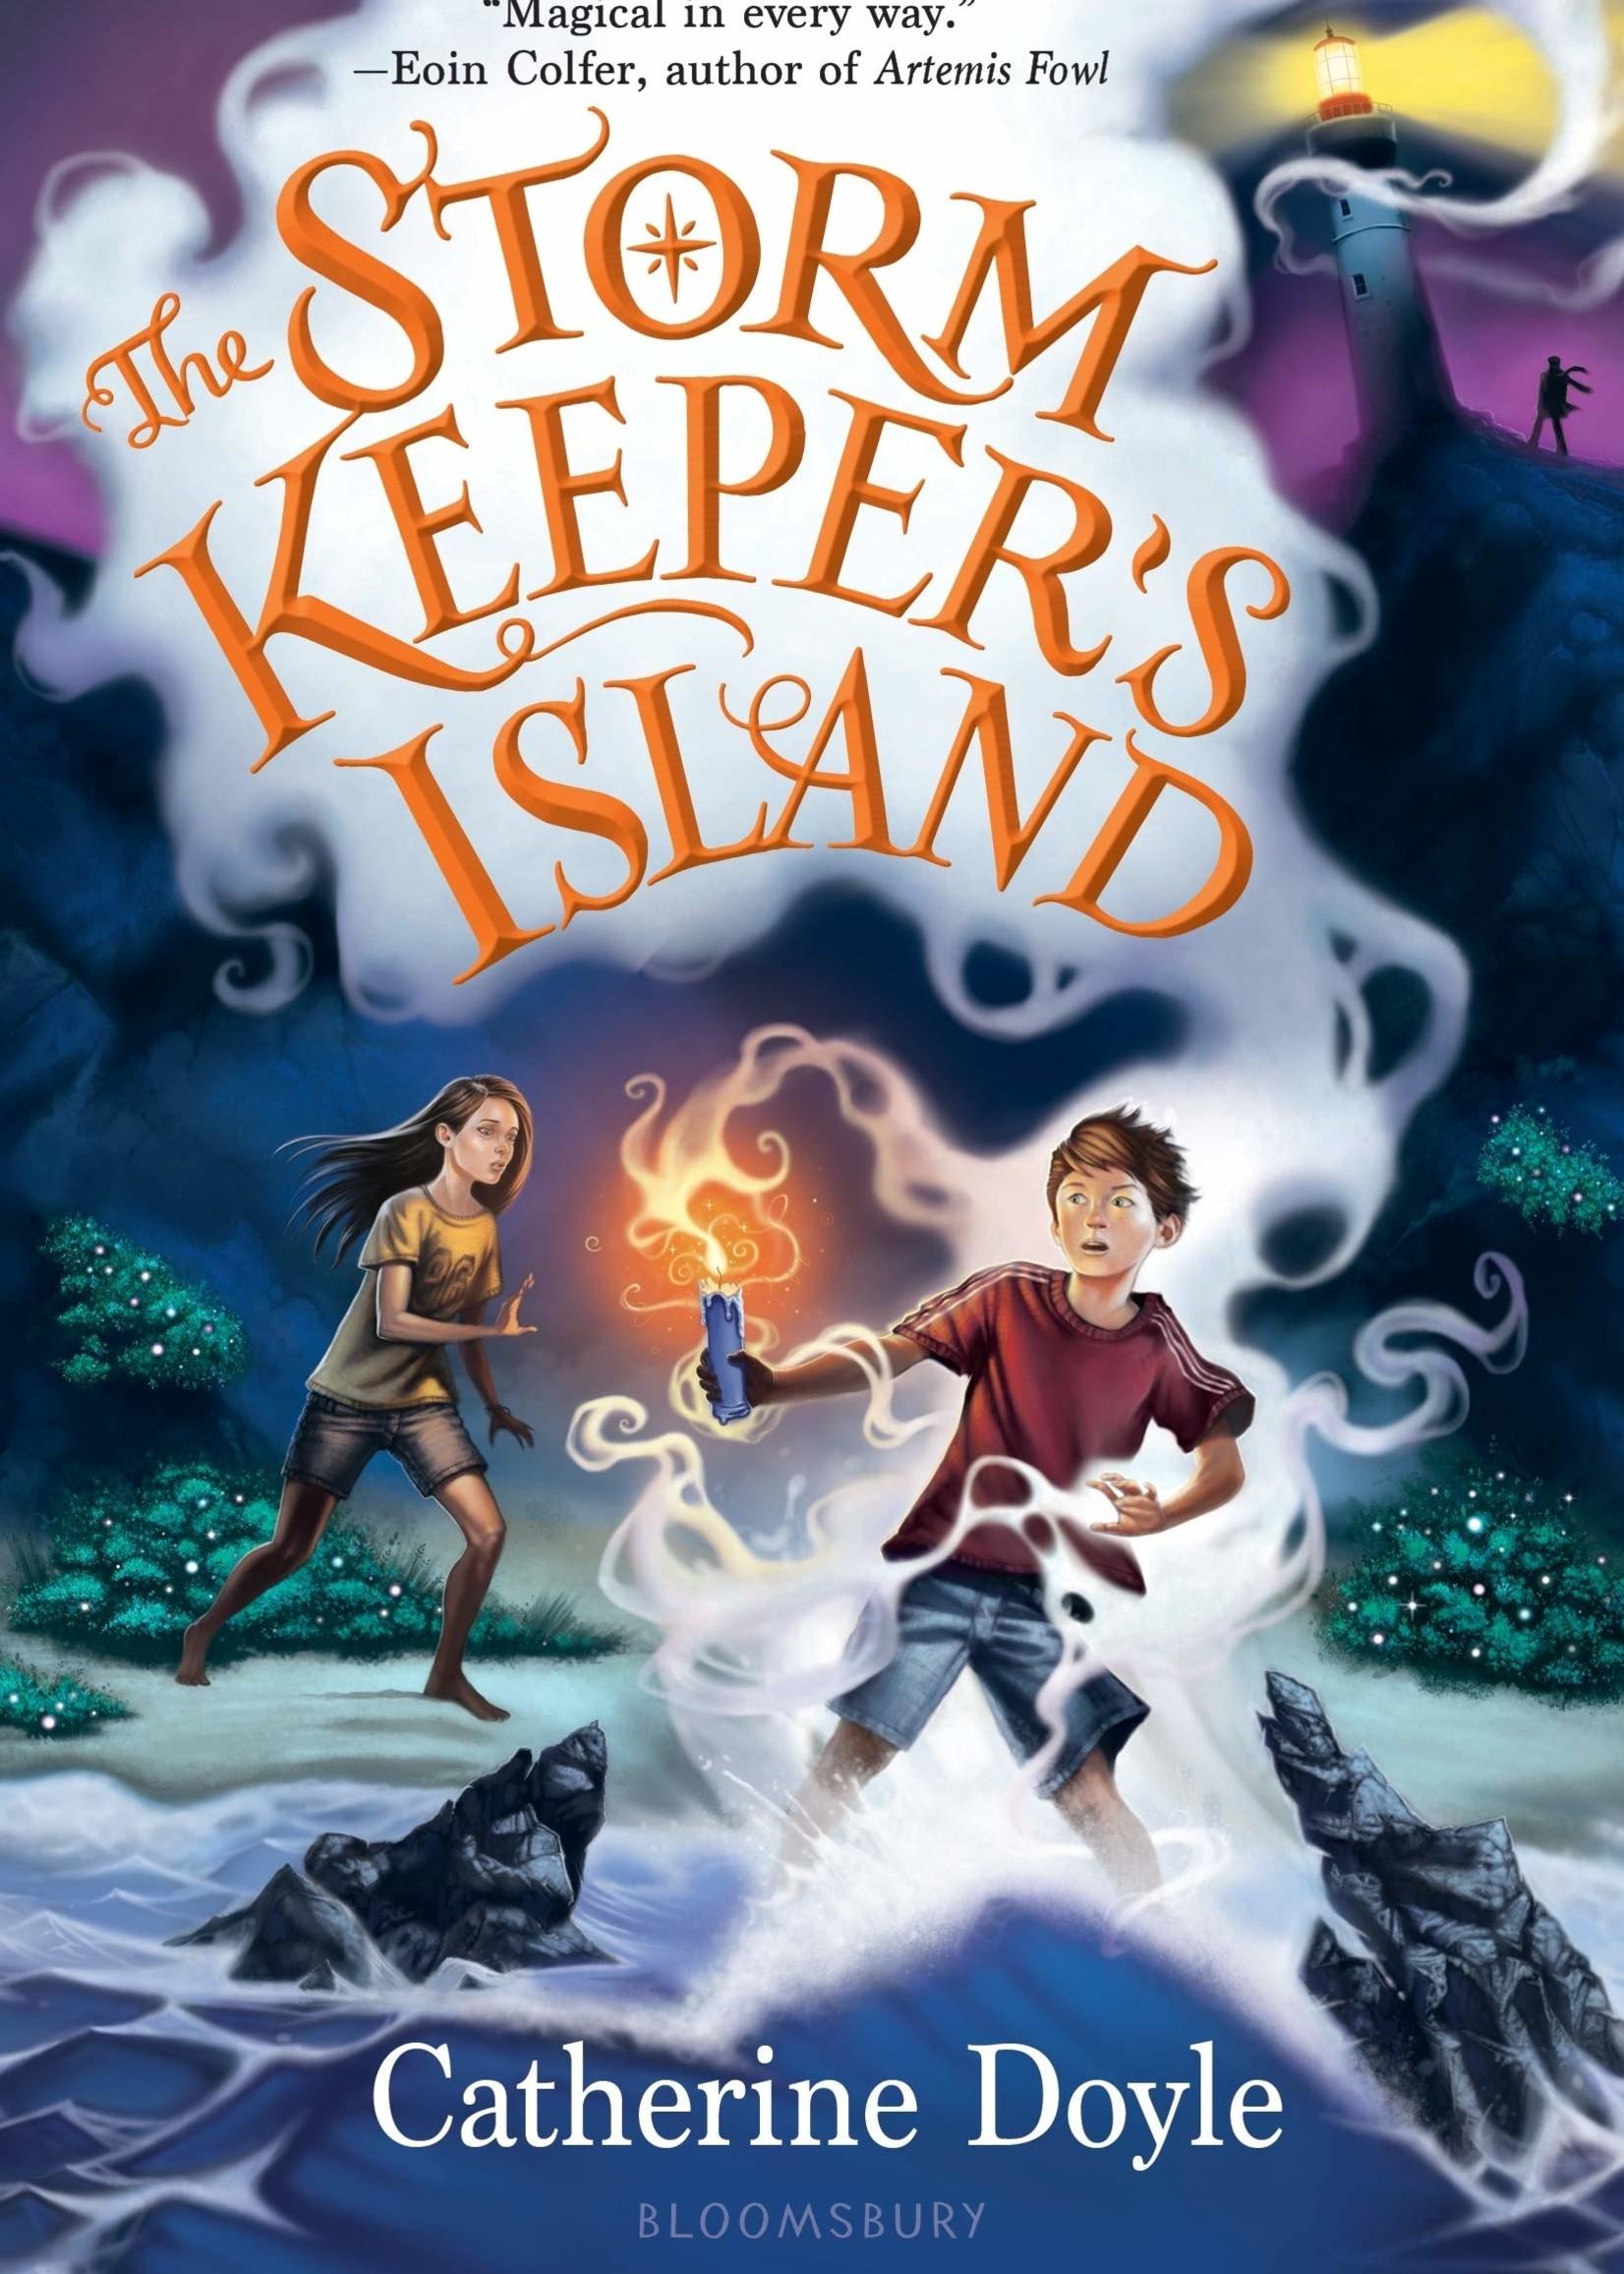 OBOB 21/22: The Storm Keeper's Island #01 - Paperback